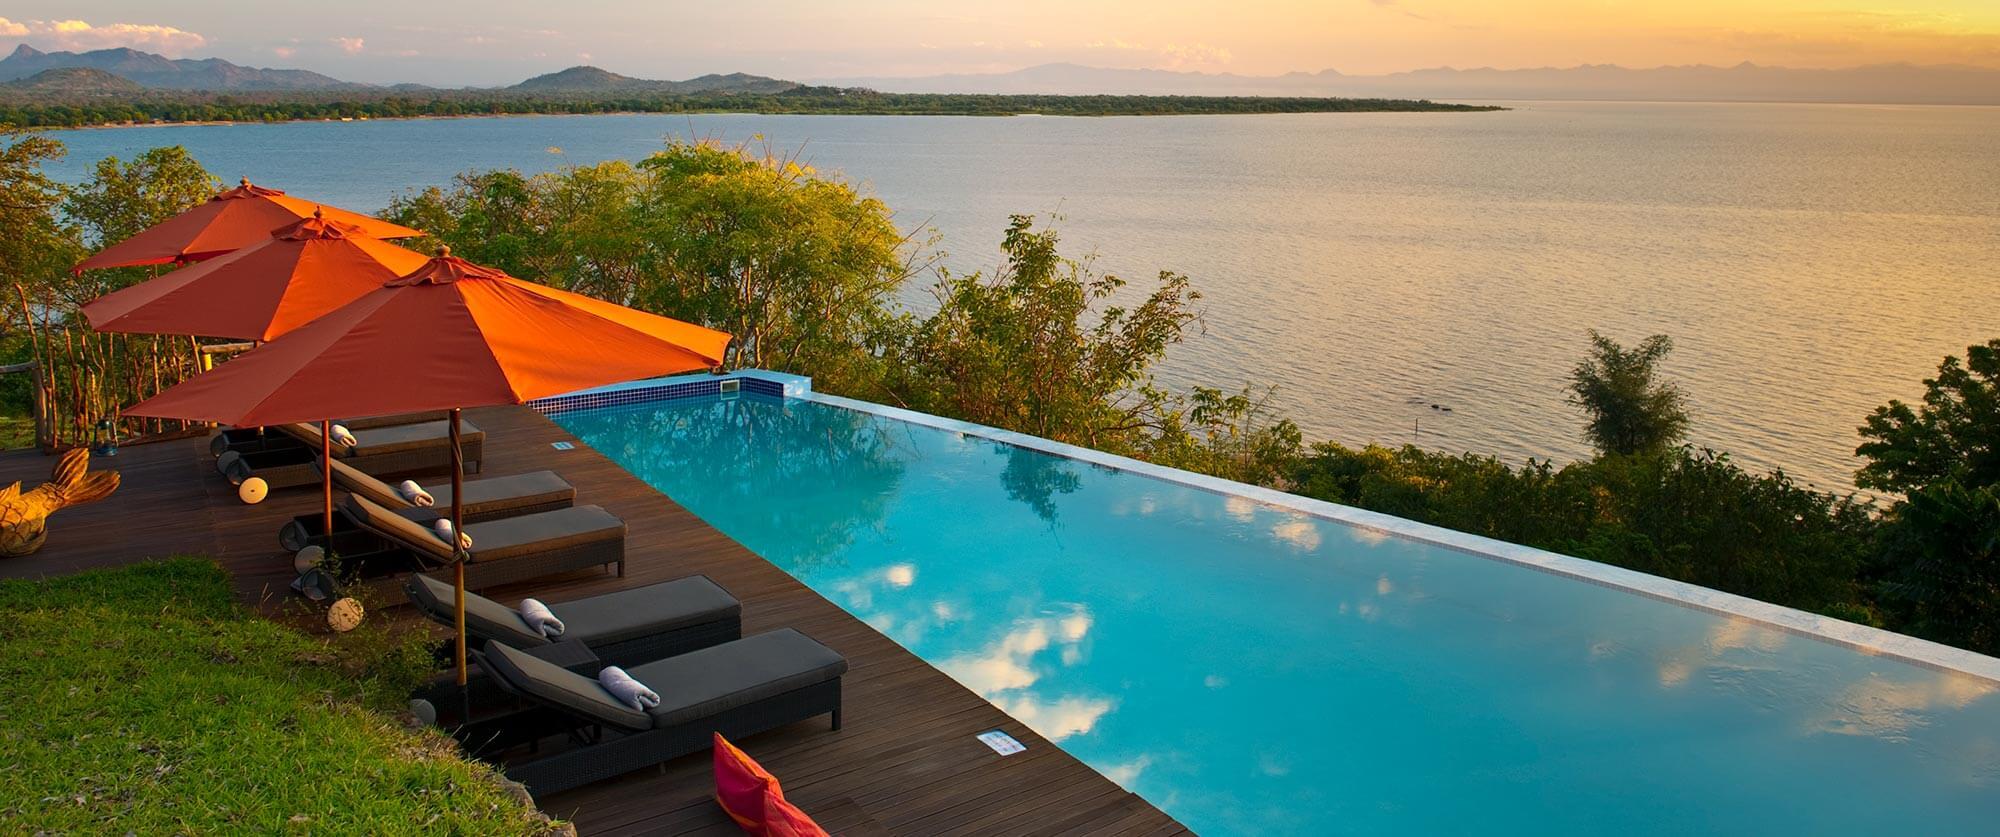 Pumulani Lodge Pool - Lake Malawi Vacation Package